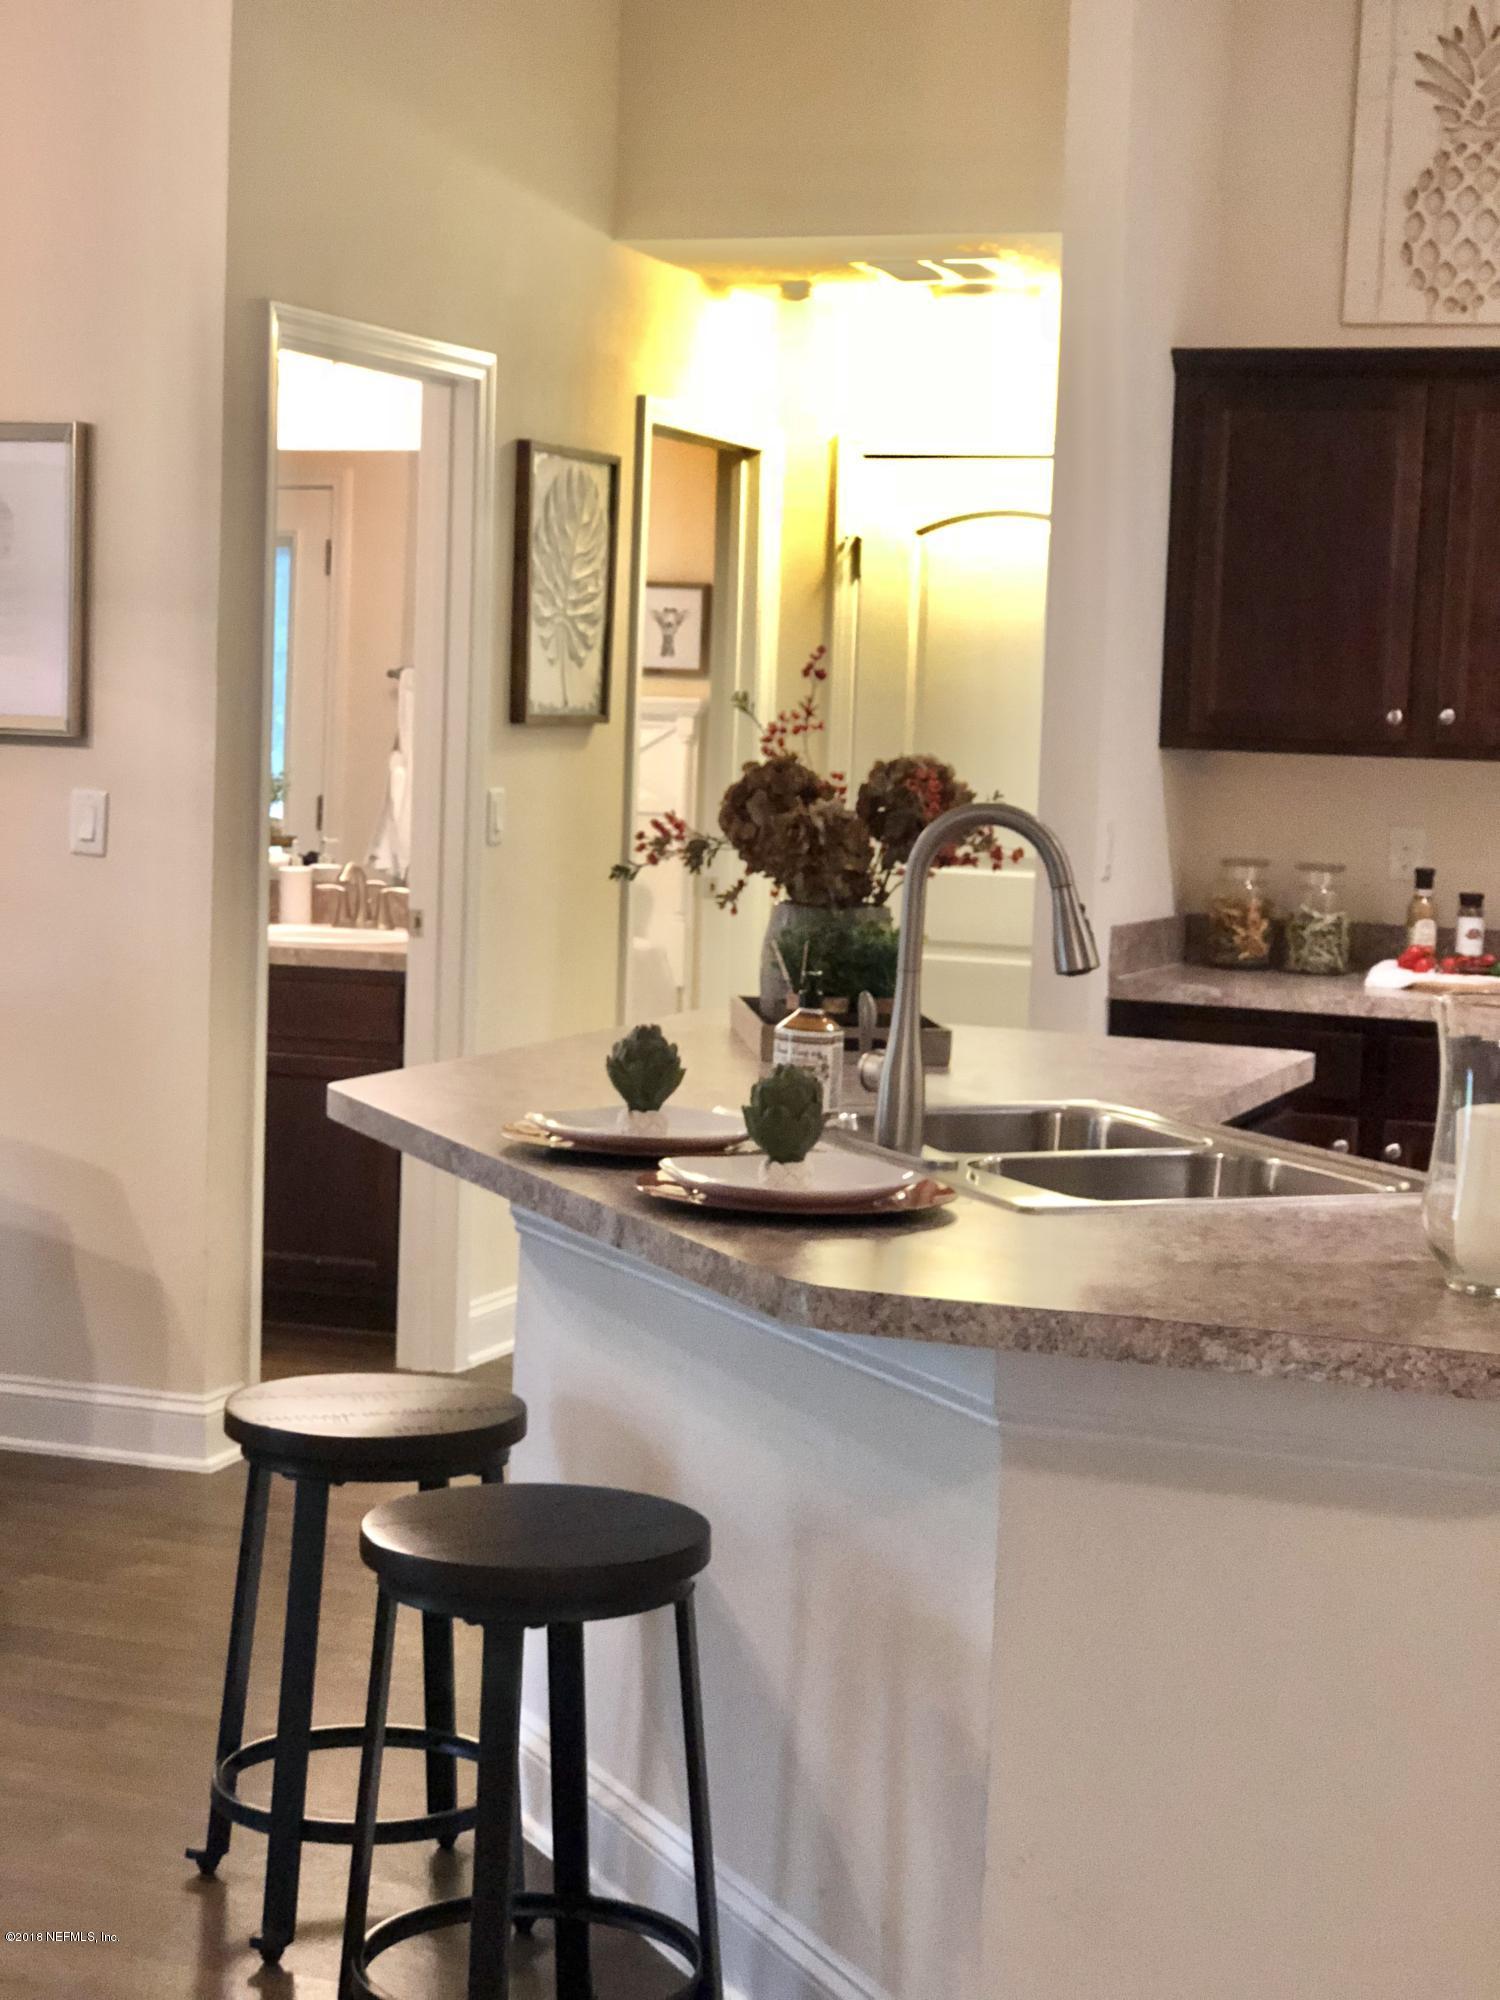 2041 JOMIL, JACKSONVILLE, FLORIDA 32218, 4 Bedrooms Bedrooms, ,3 BathroomsBathrooms,Residential - single family,For sale,JOMIL,953657